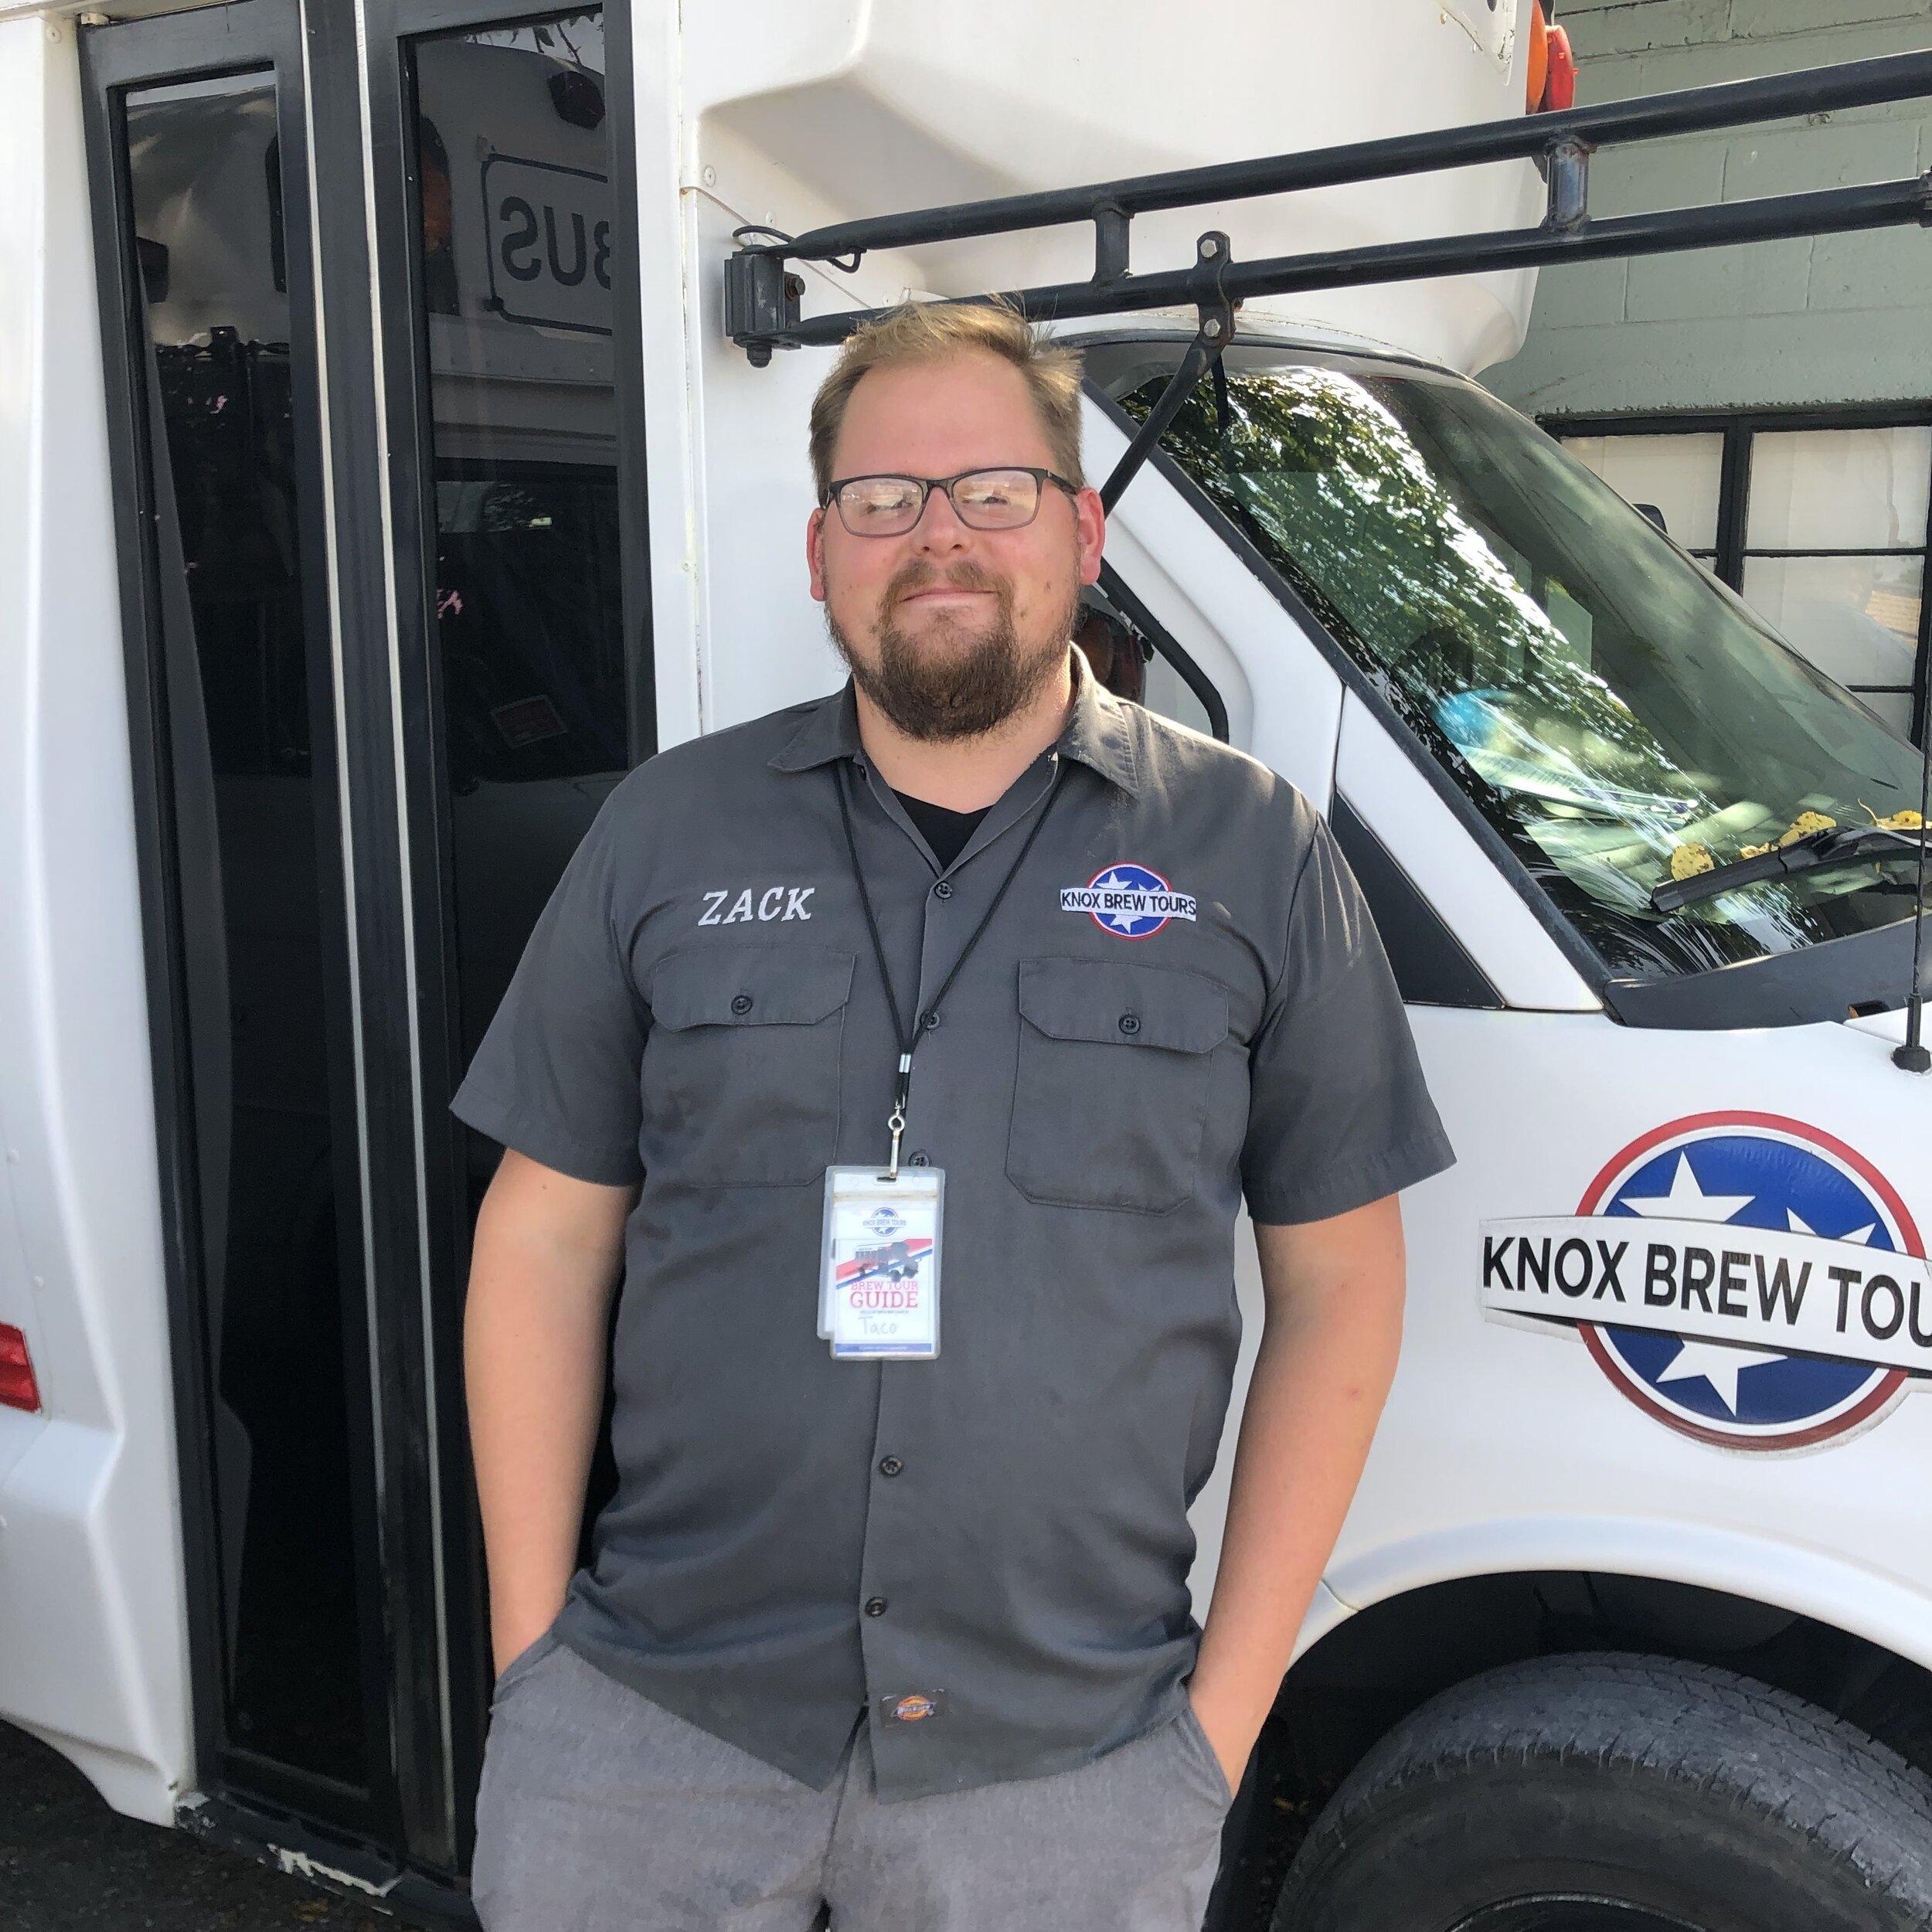 Zack Roskop (aka Taco) - Owner/Operator, Guide, Driver